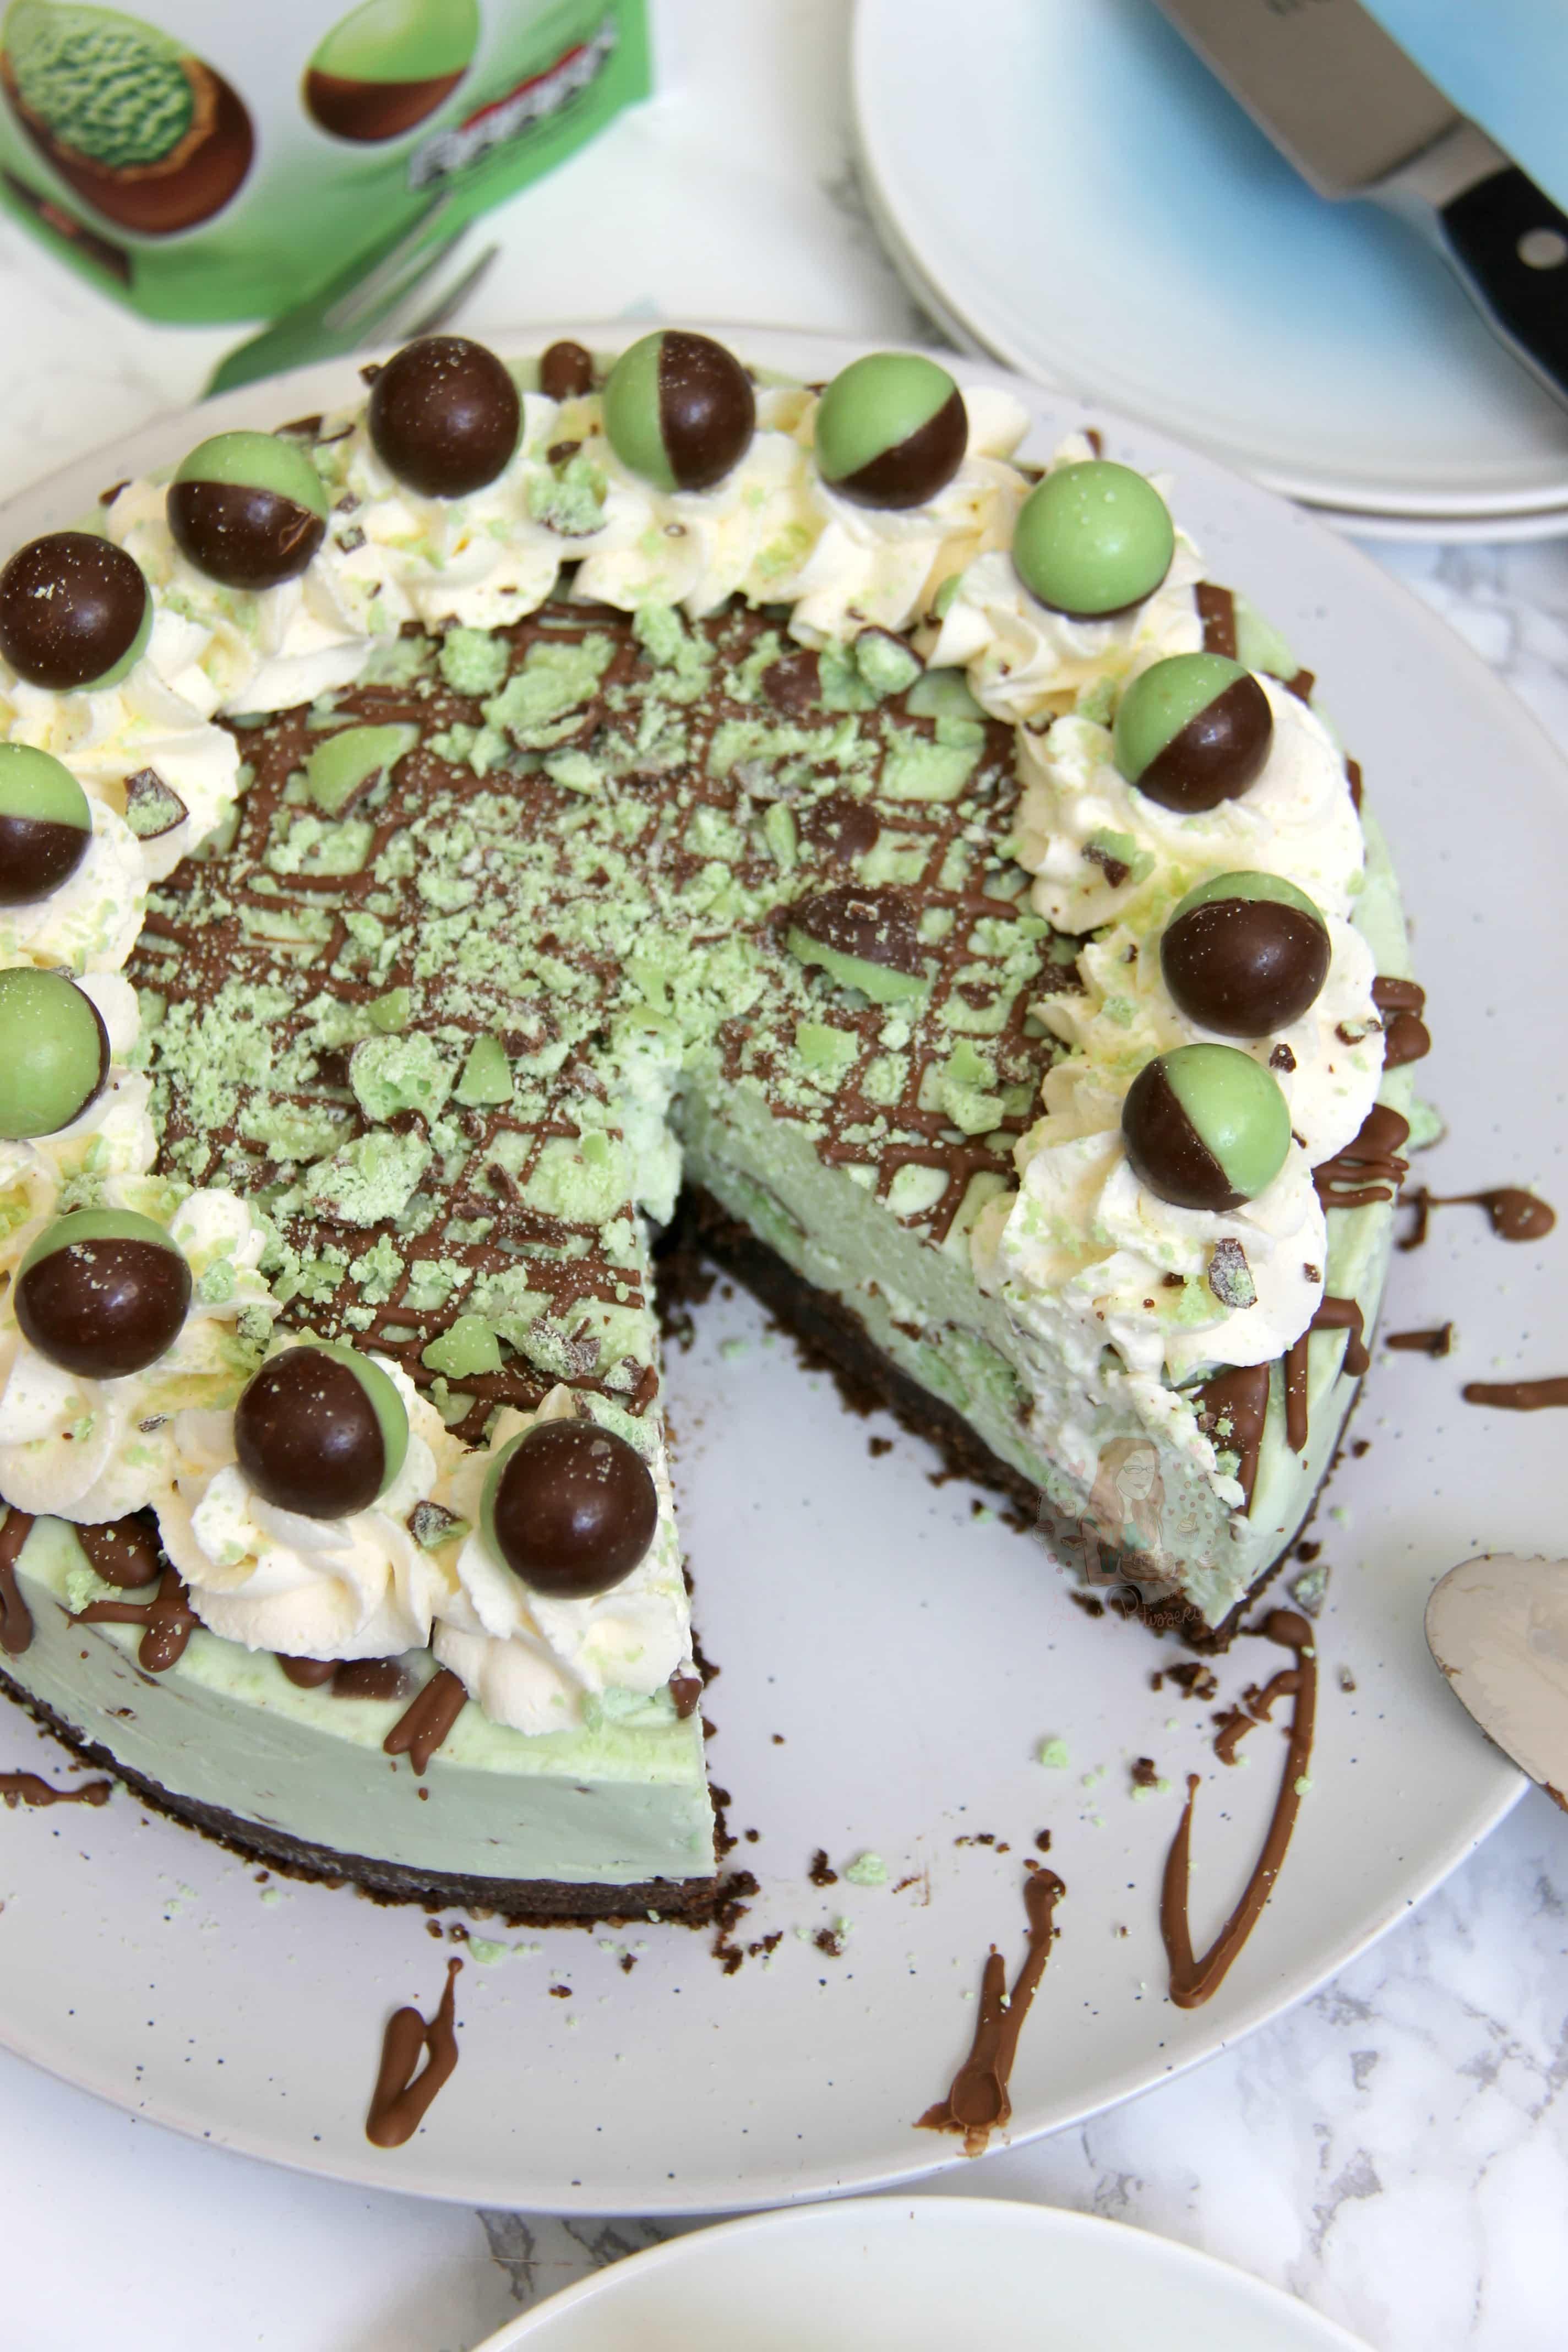 Paula Deen Chocolate Mint Cheesecake